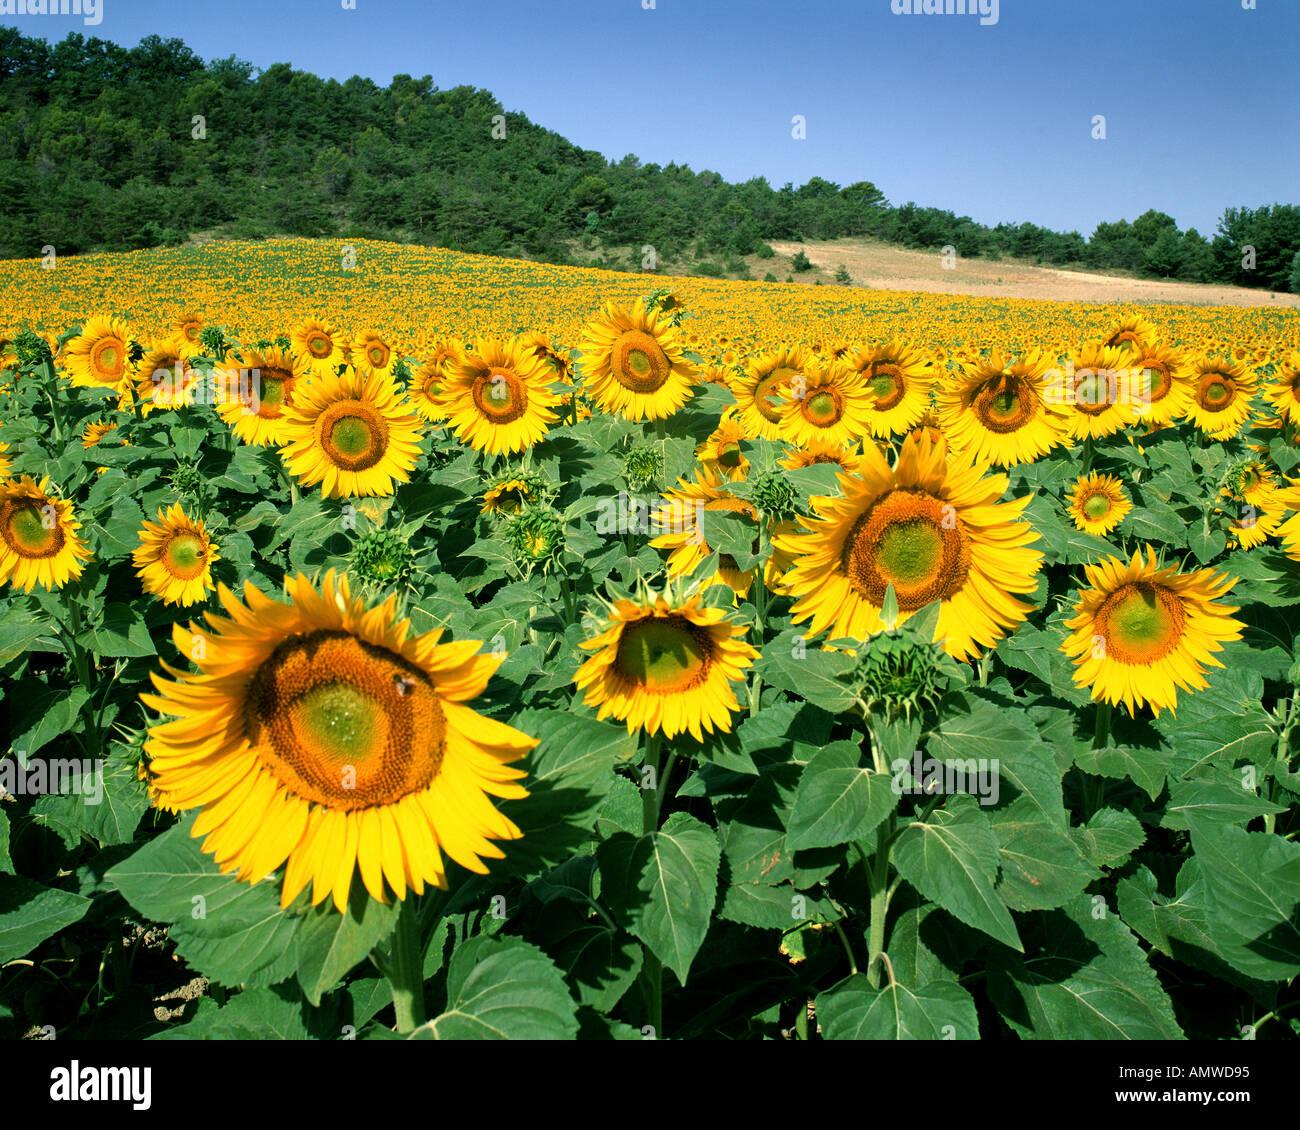 FR - PLATEAU DE VAUCLUSE: Feld von Sonnenblumen Stockbild